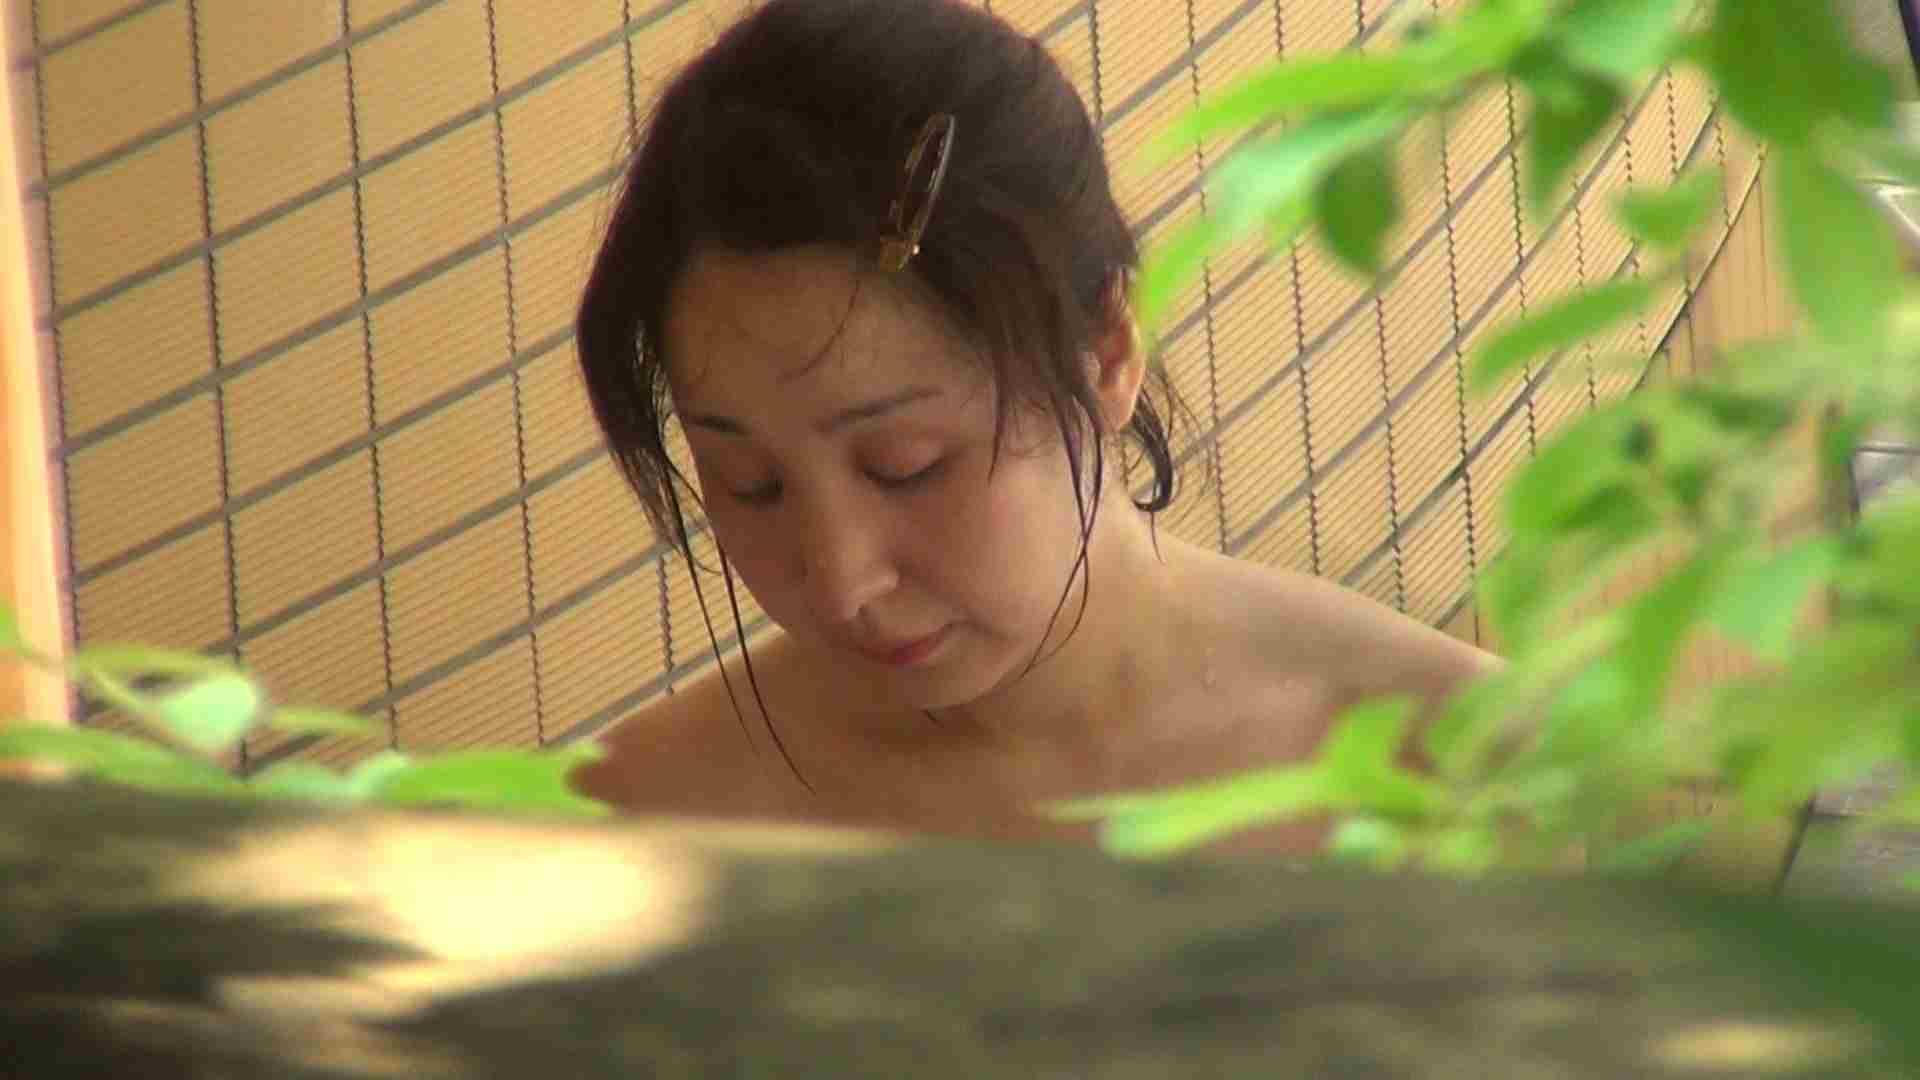 Vol.78 熟しても可愛らしさ残る年増 美女 AV無料動画キャプチャ 58画像 12